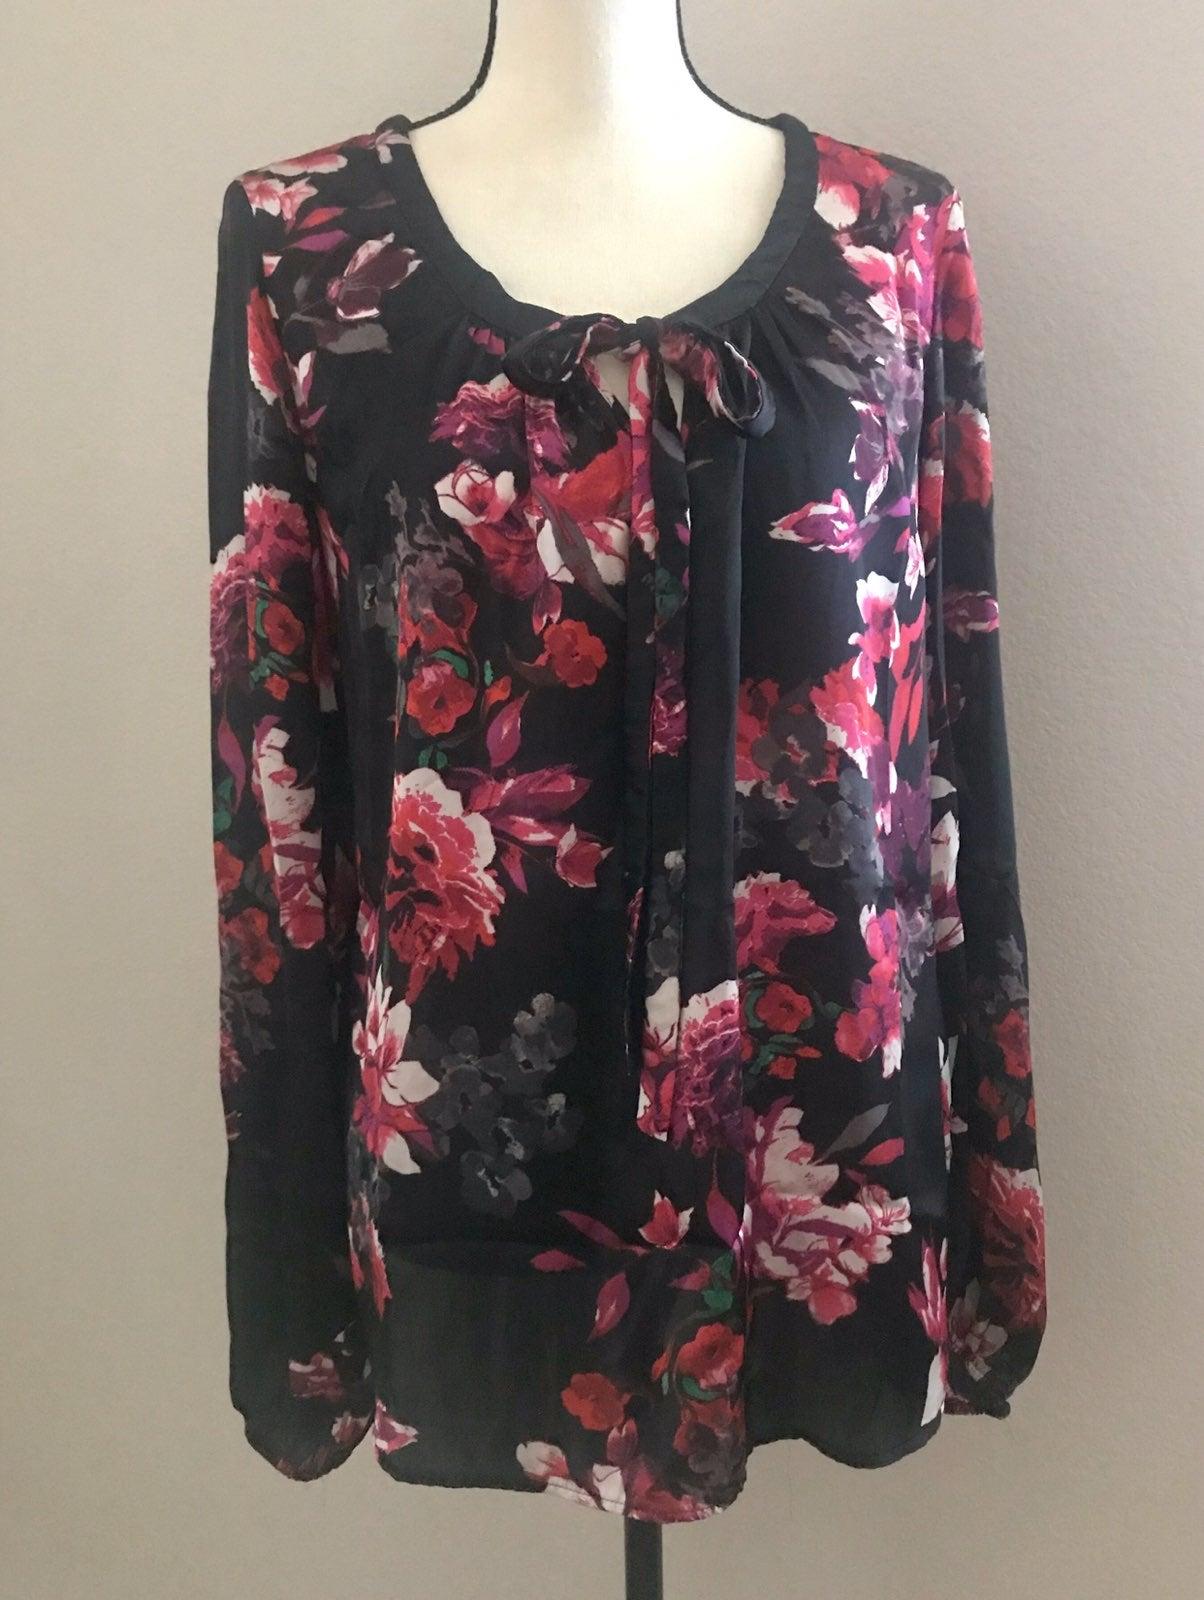 Floral Blouse - Kirna Zabete [Target]